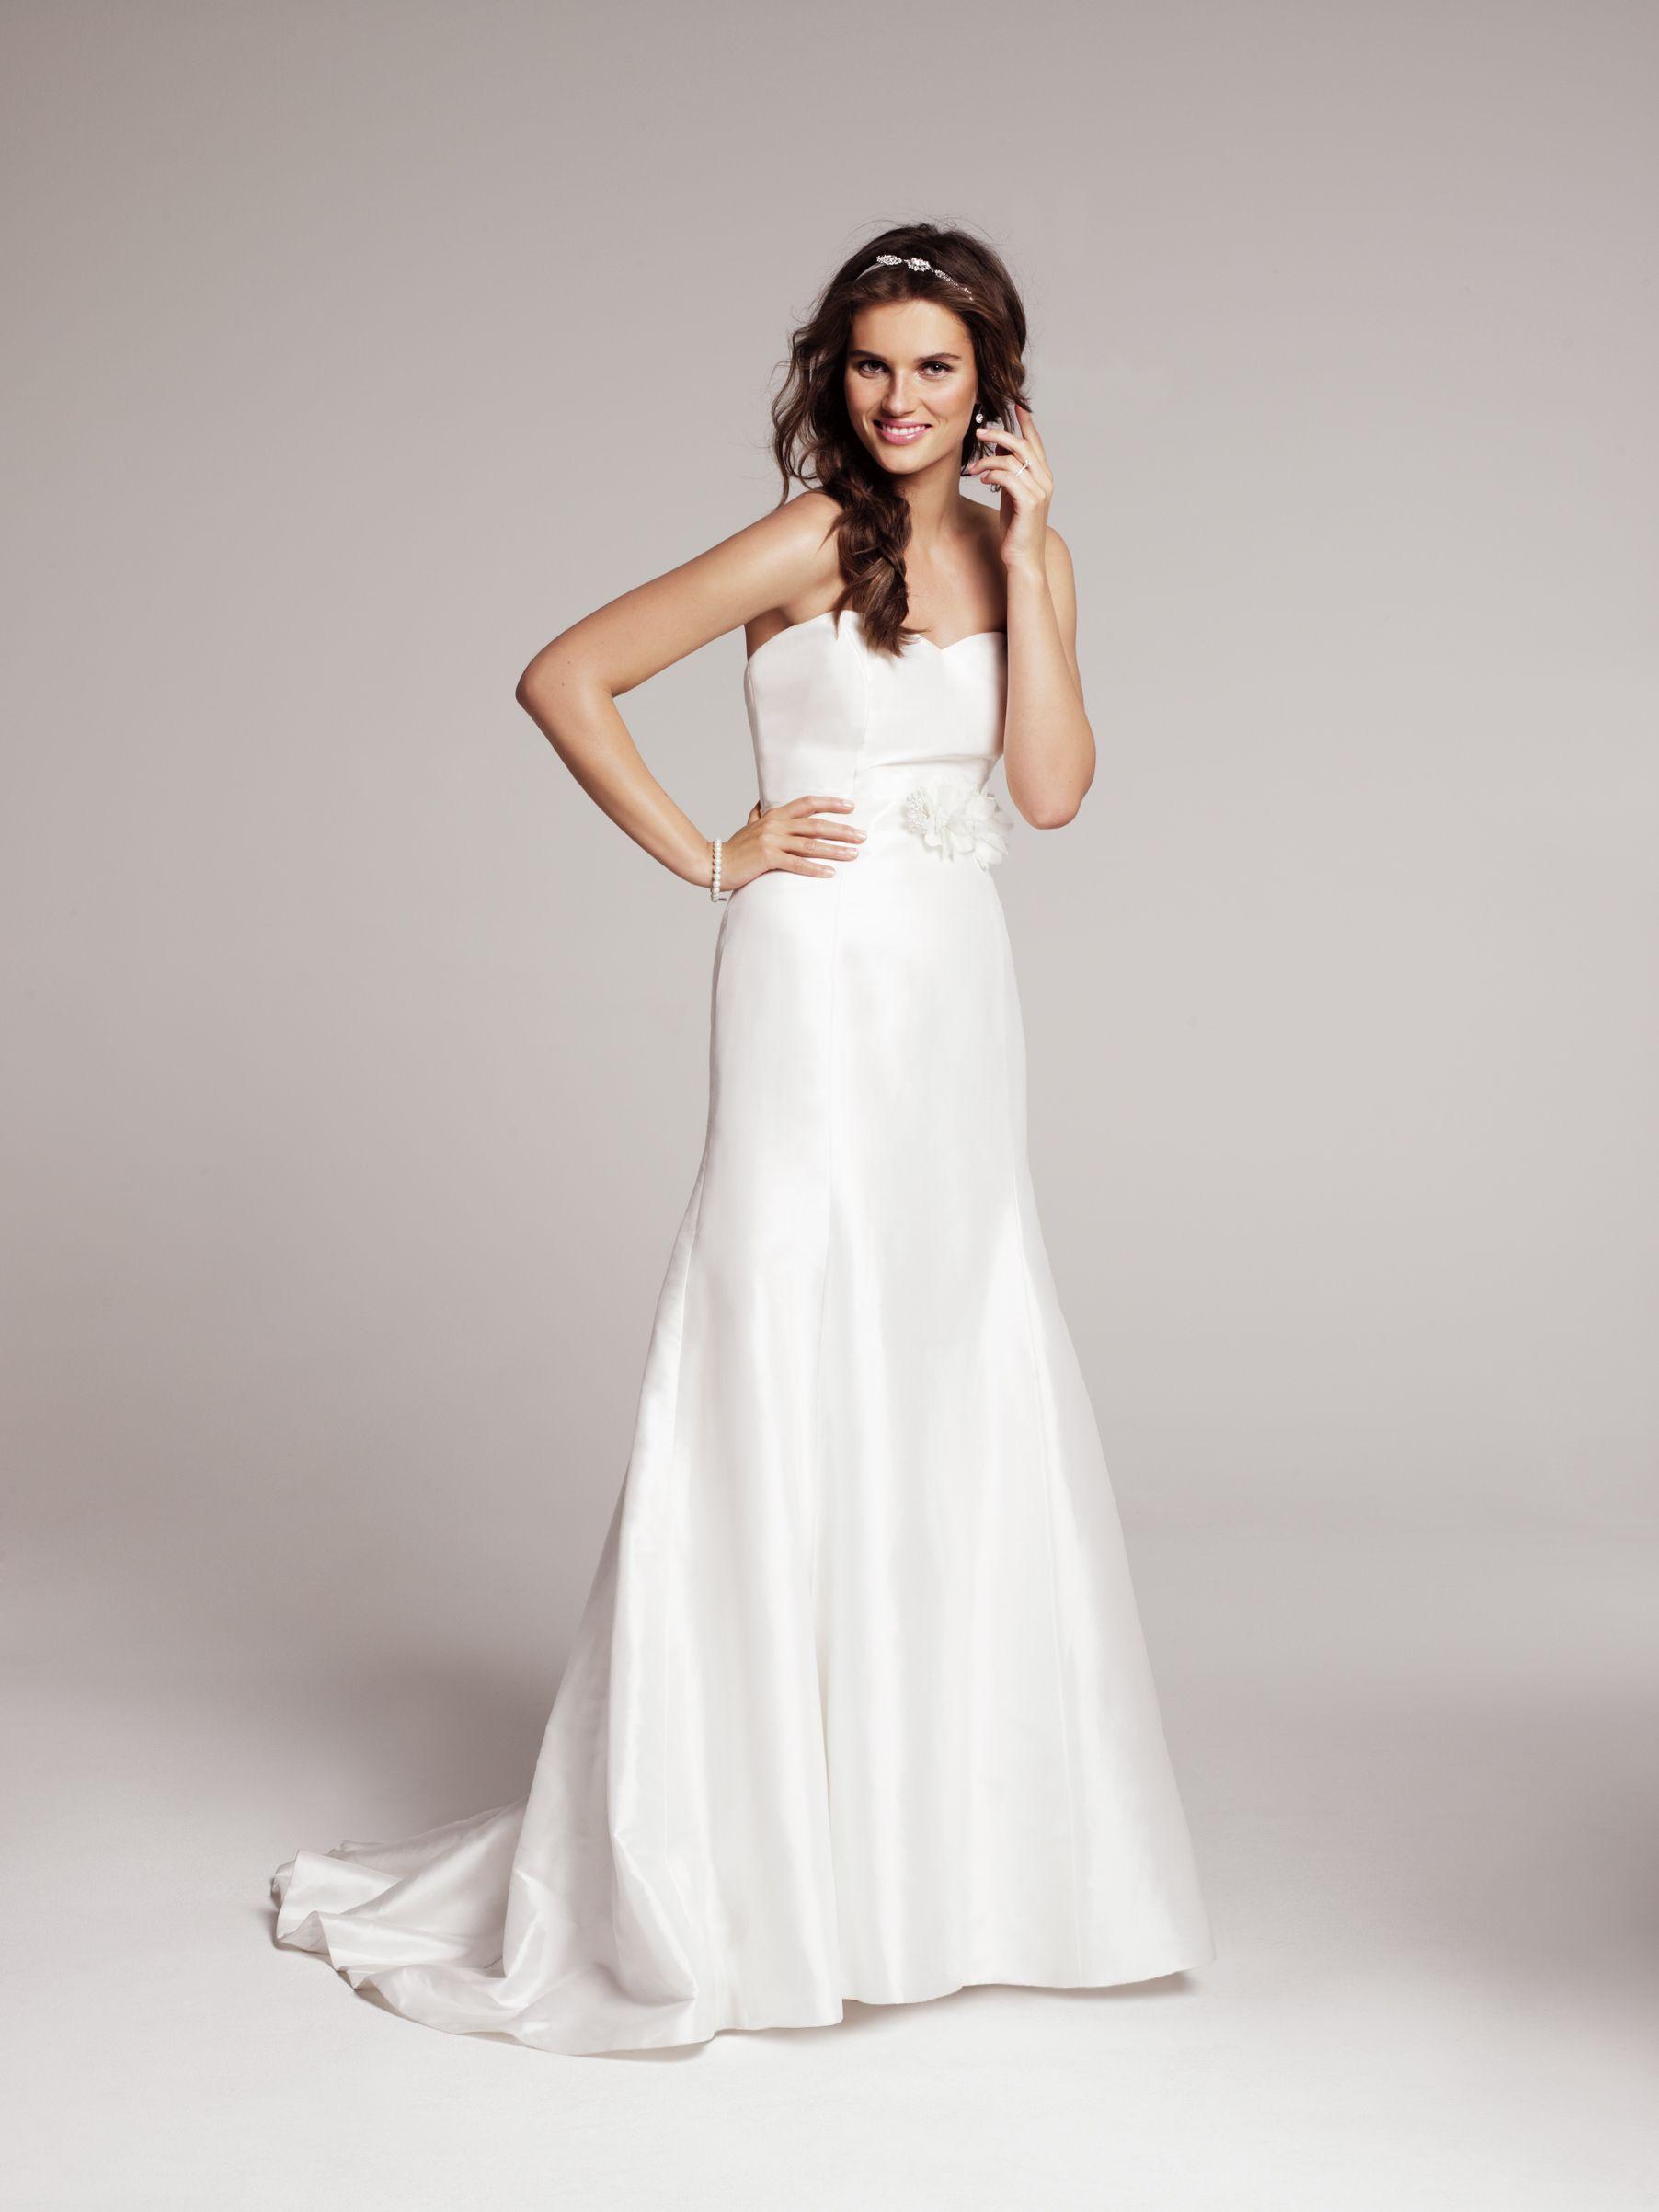 wedding dresses nordstrom Heidi Elnora Coco Marie Strapless Silk Gown Nordstrom